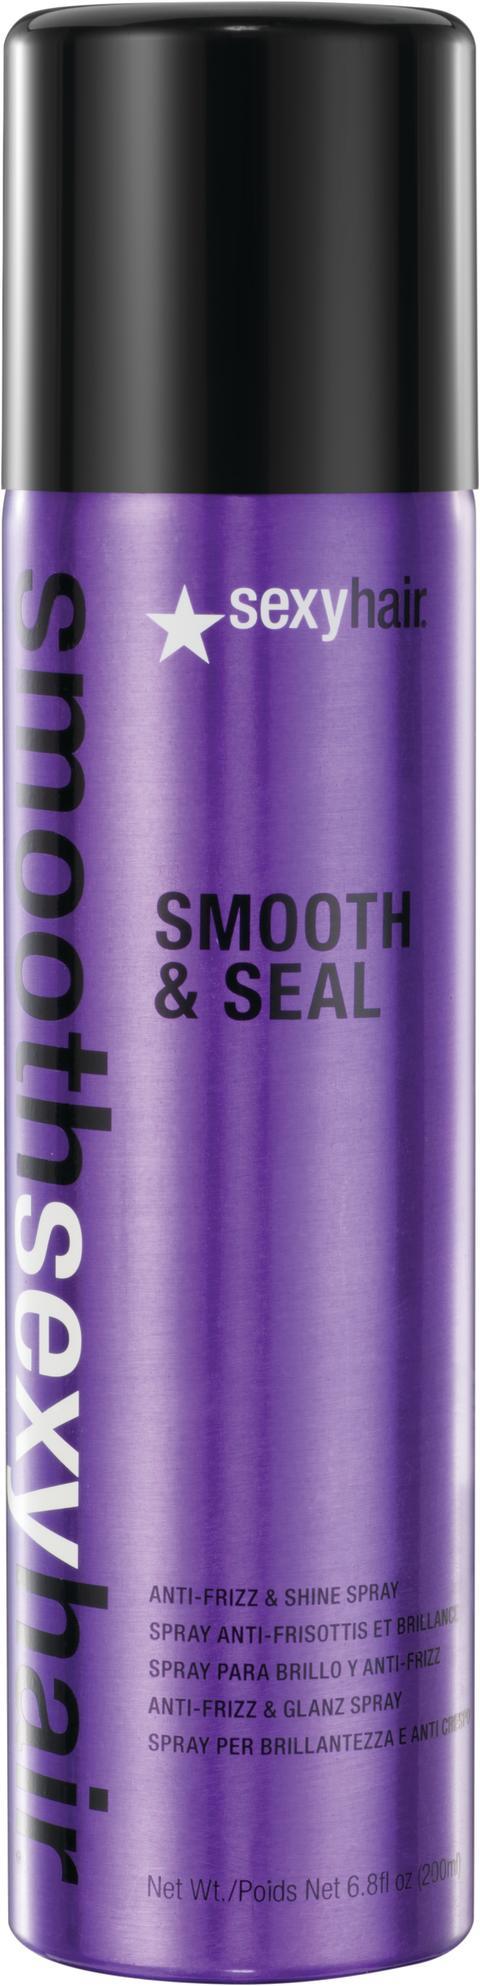 Smooth Sexy Hair  - Smooth & Seal